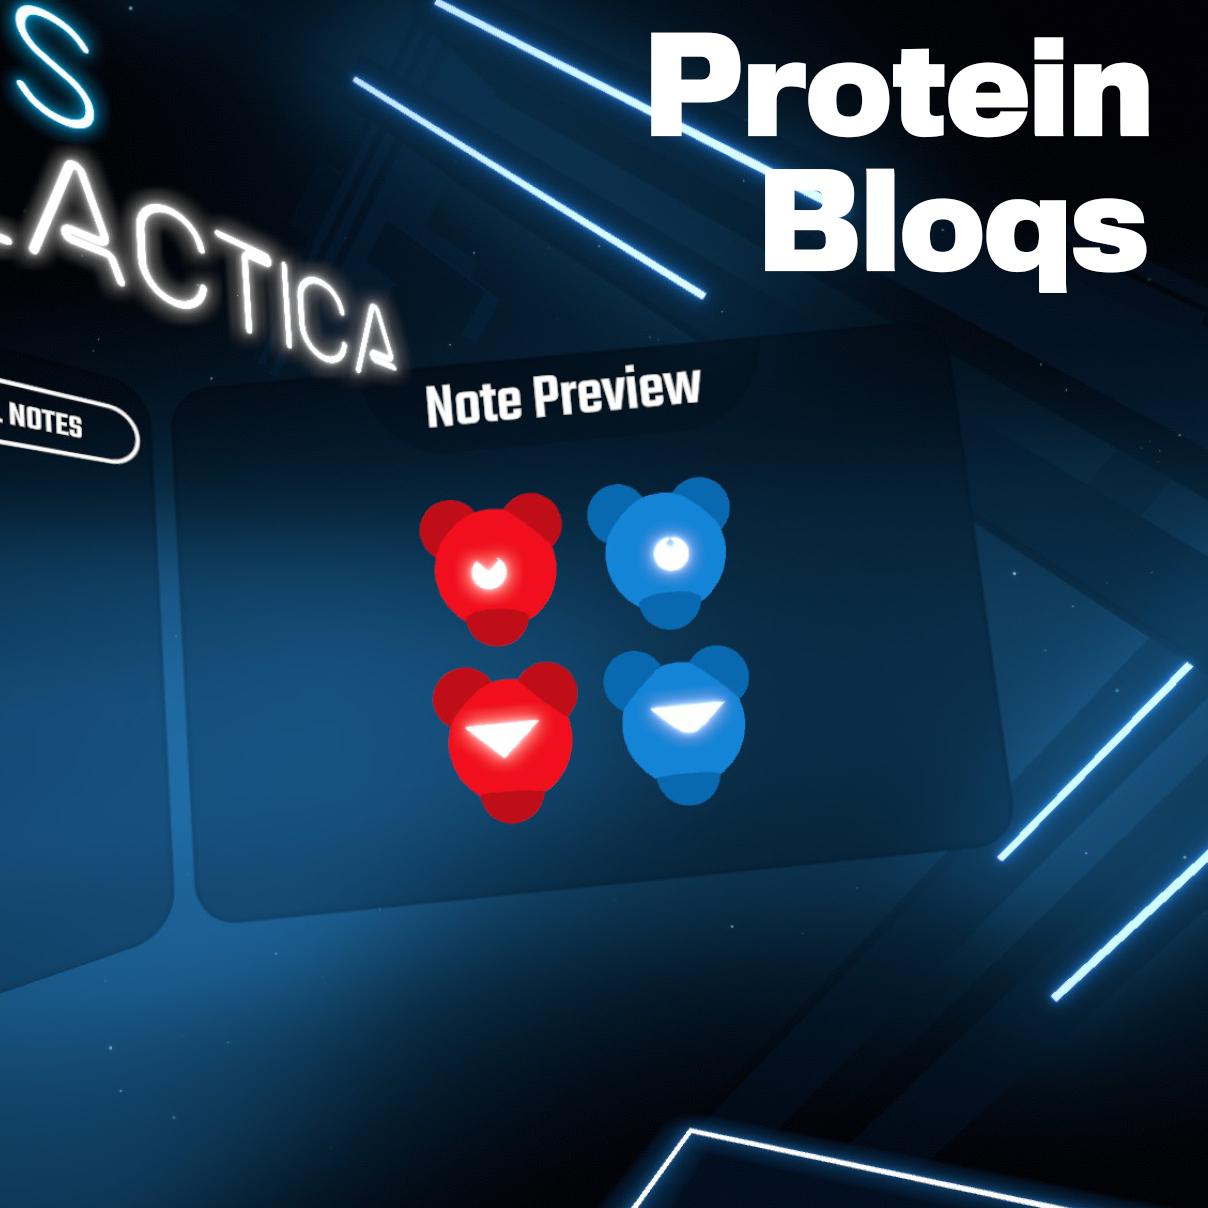 Protein Bloqs